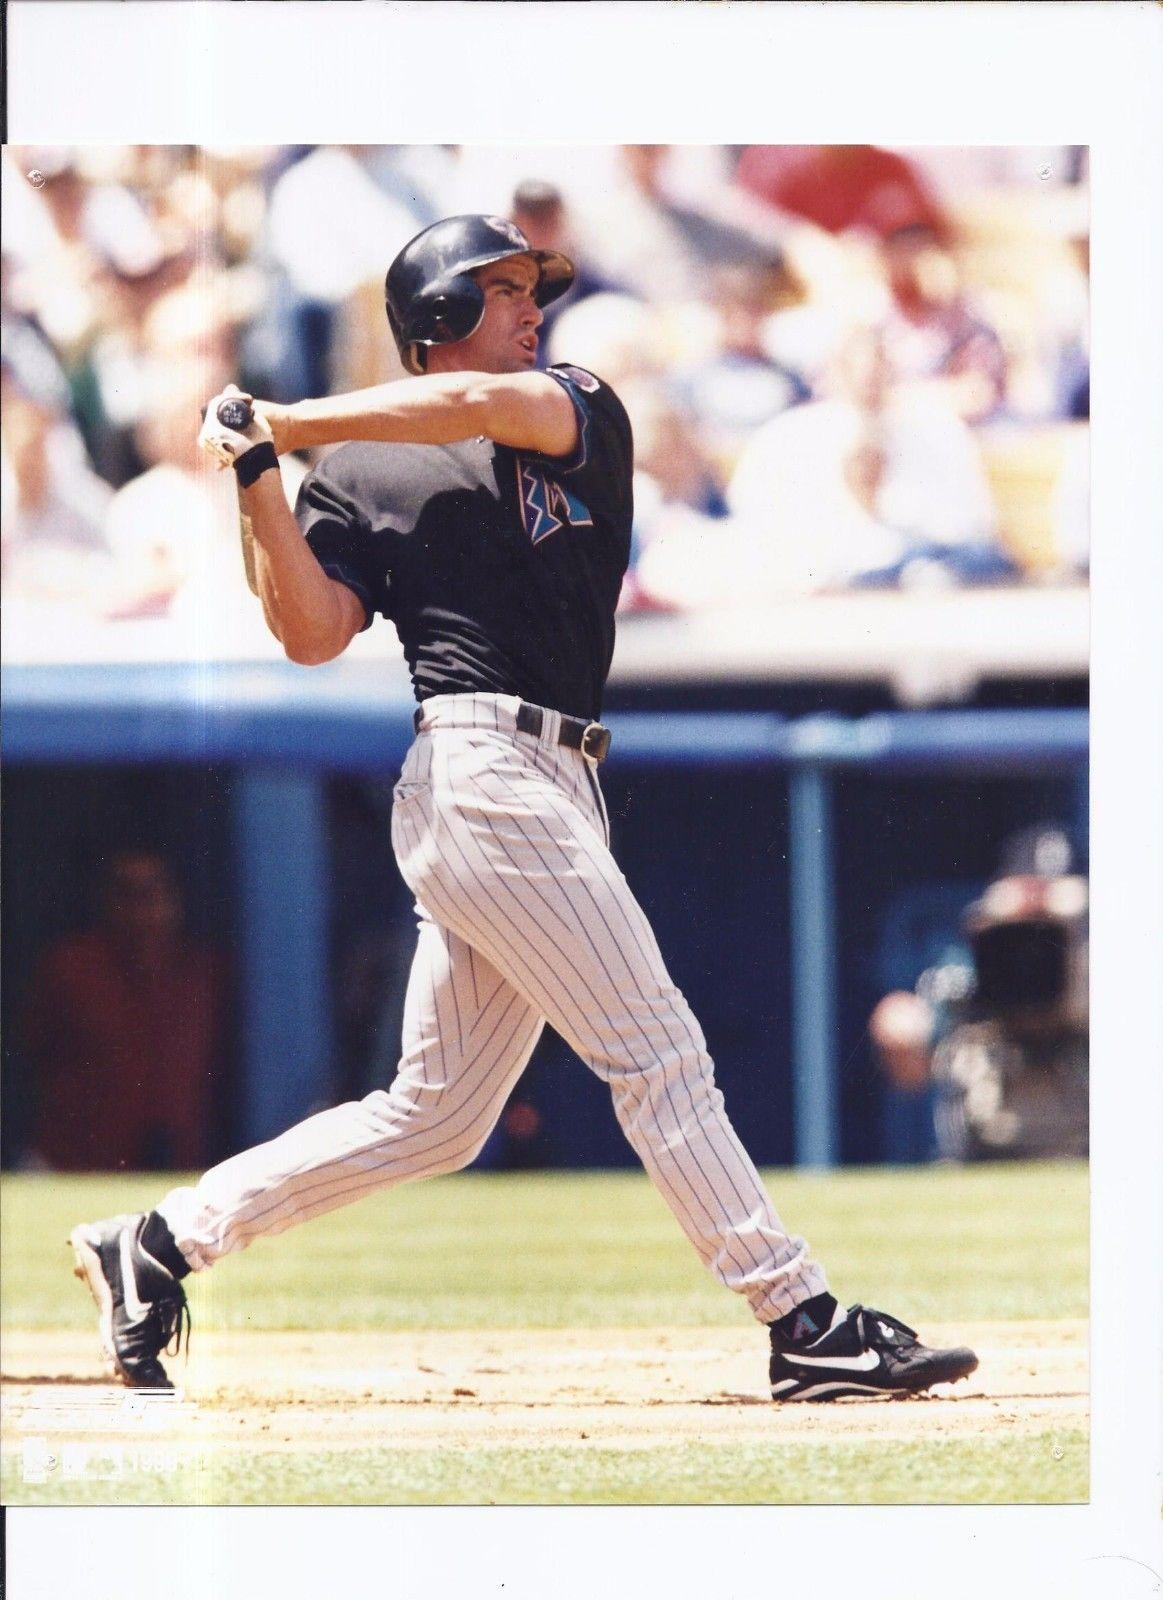 steve finley 8x10 Unsigned Photo MLB Diamondbacks Giants Dodgers Rockies Padres - $9.50